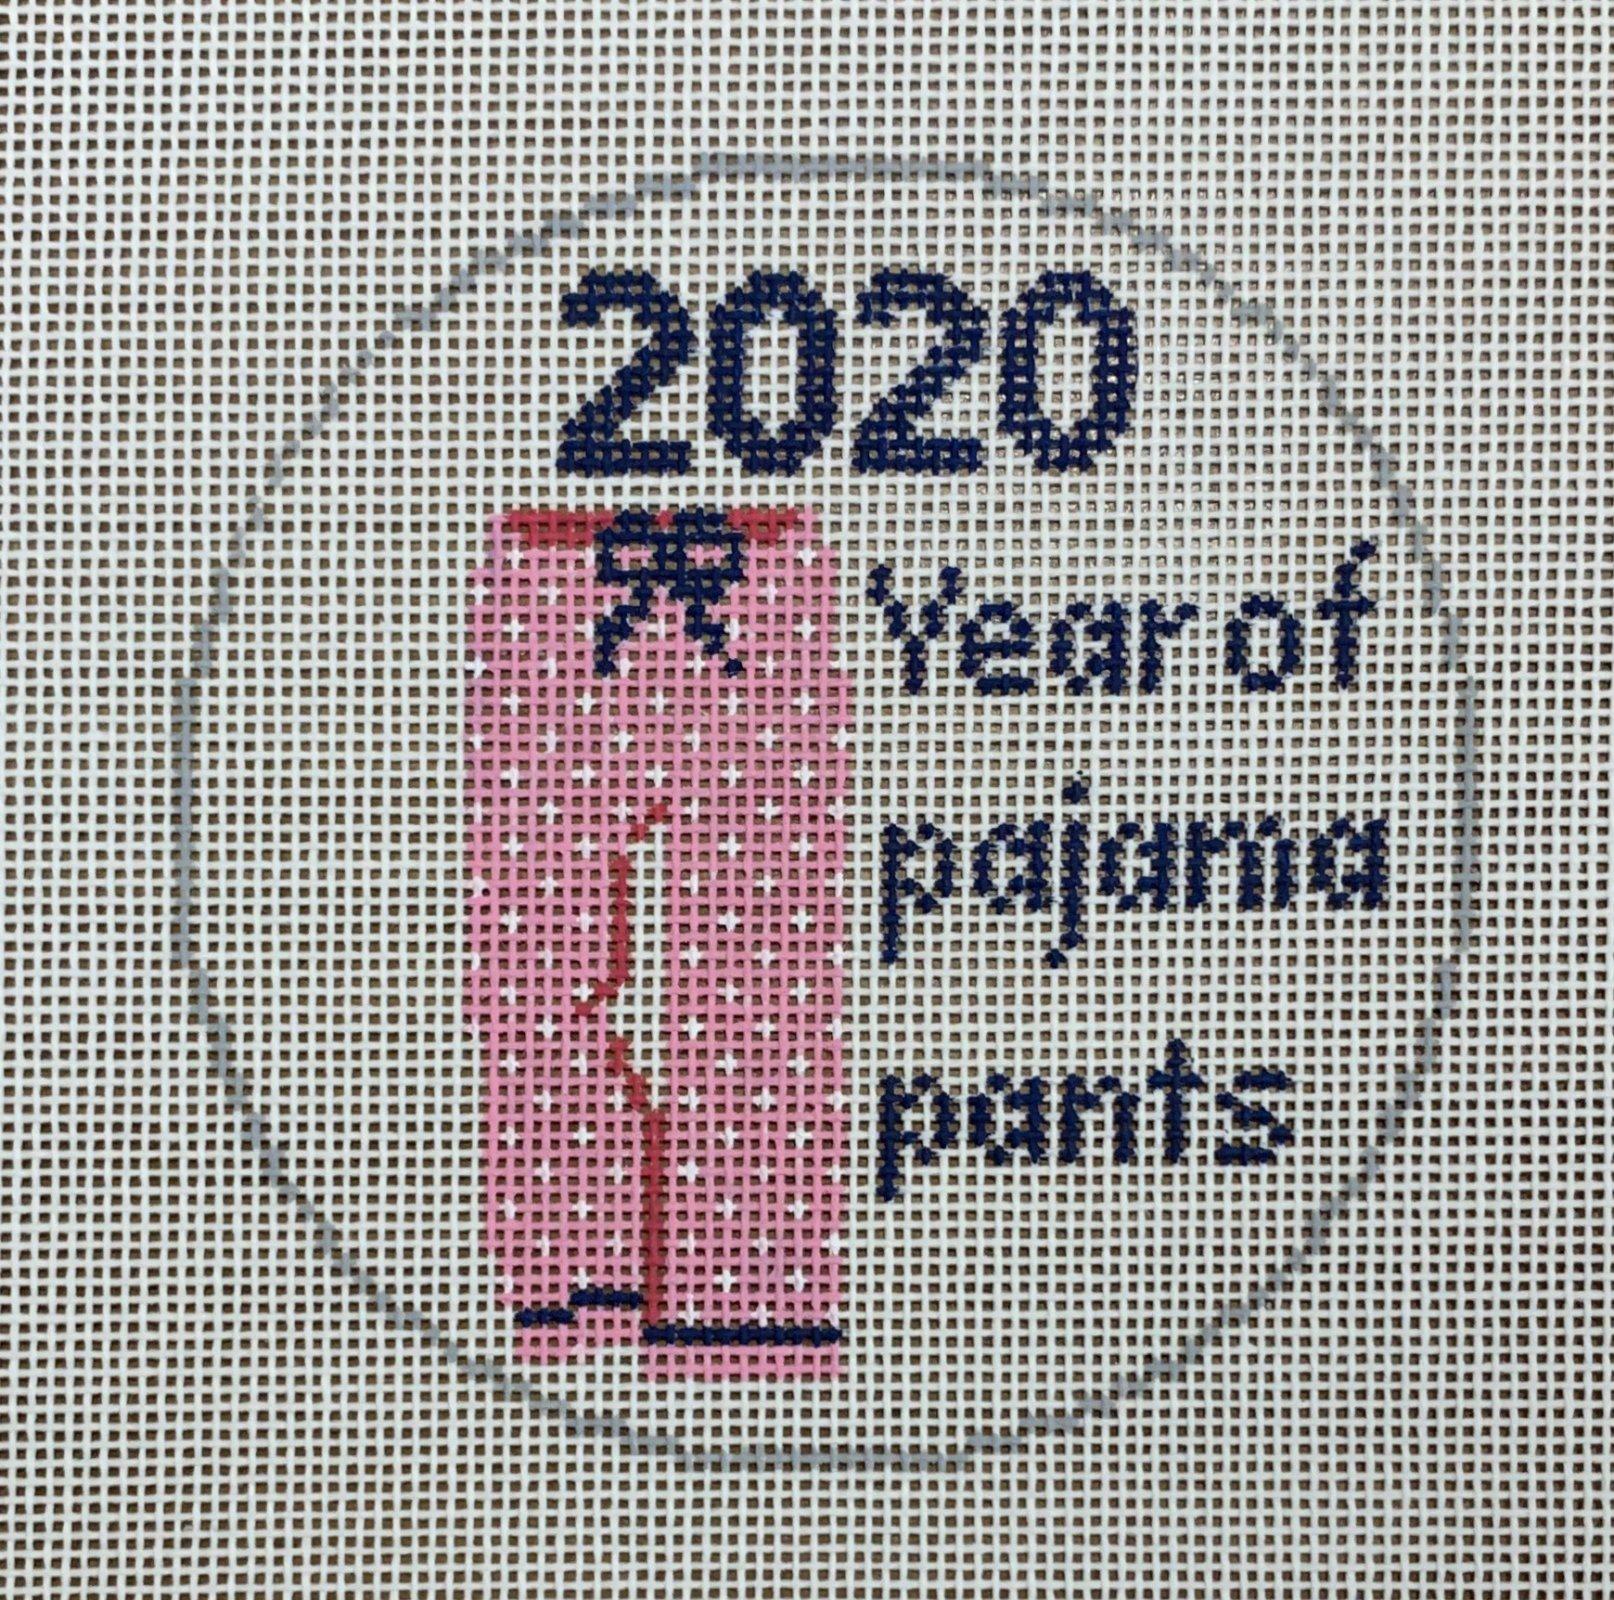 The Year of Pajama Pants